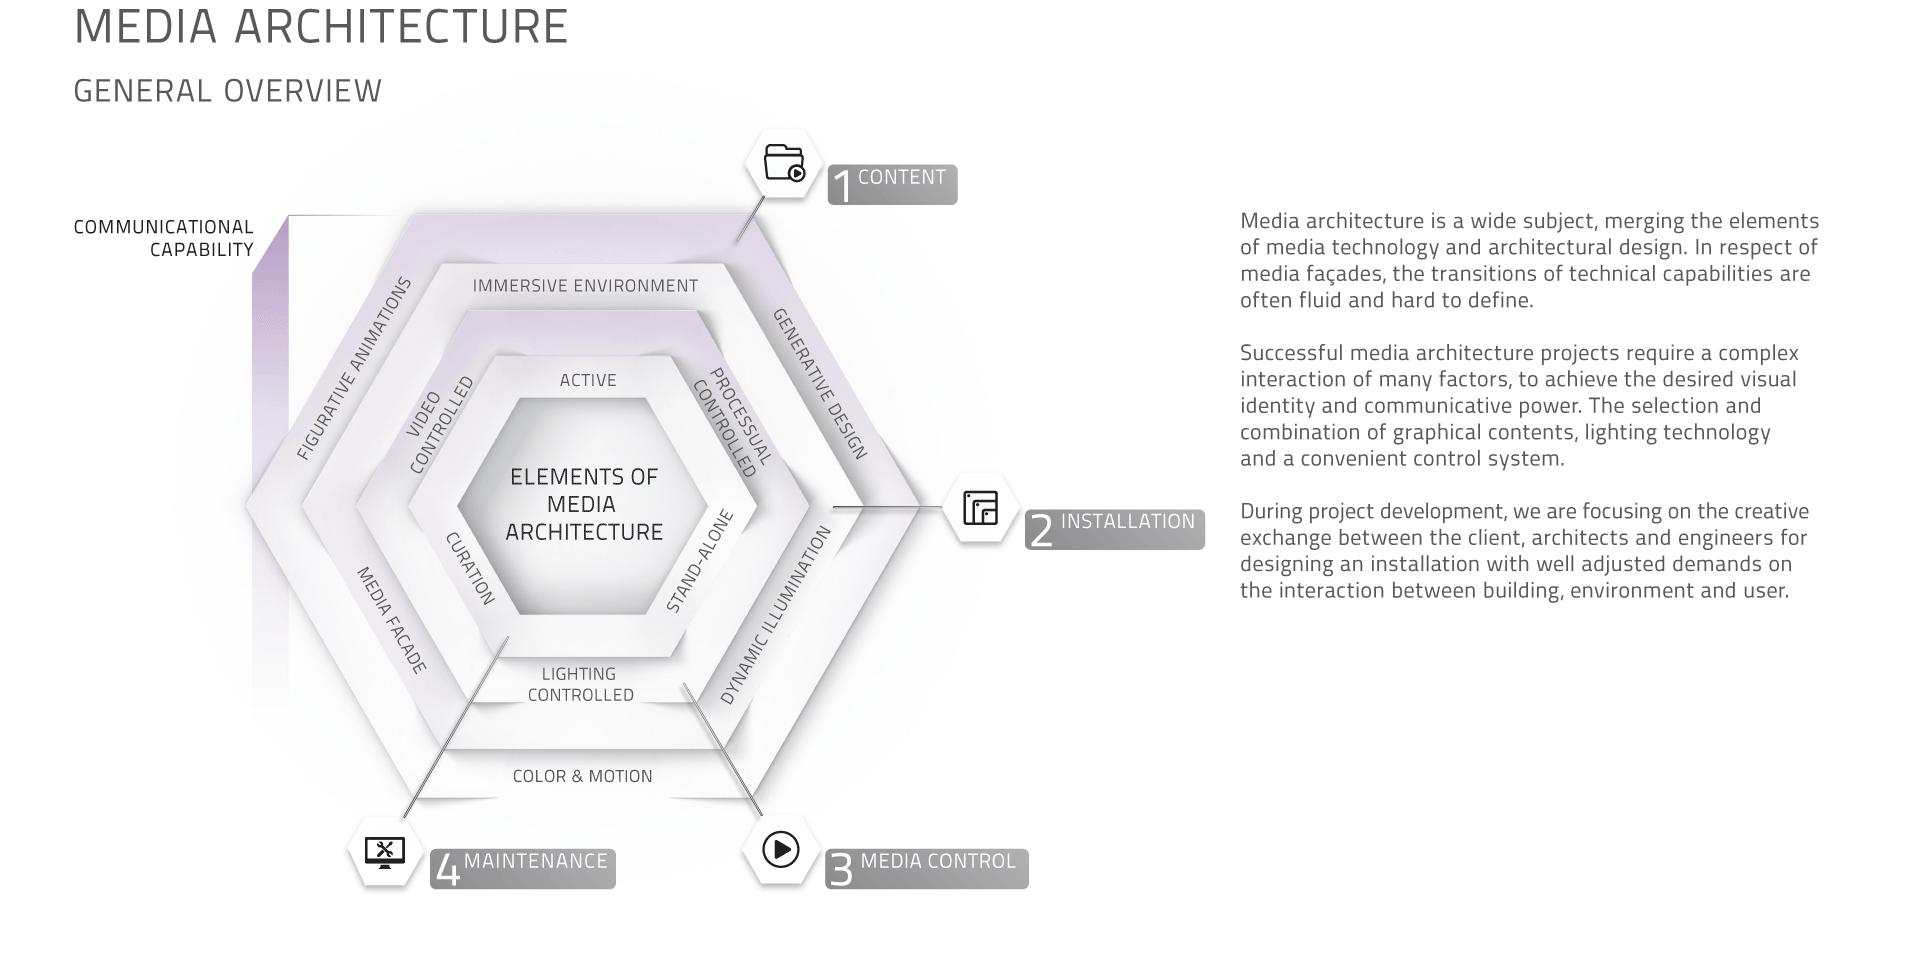 content_diagramm_005.png